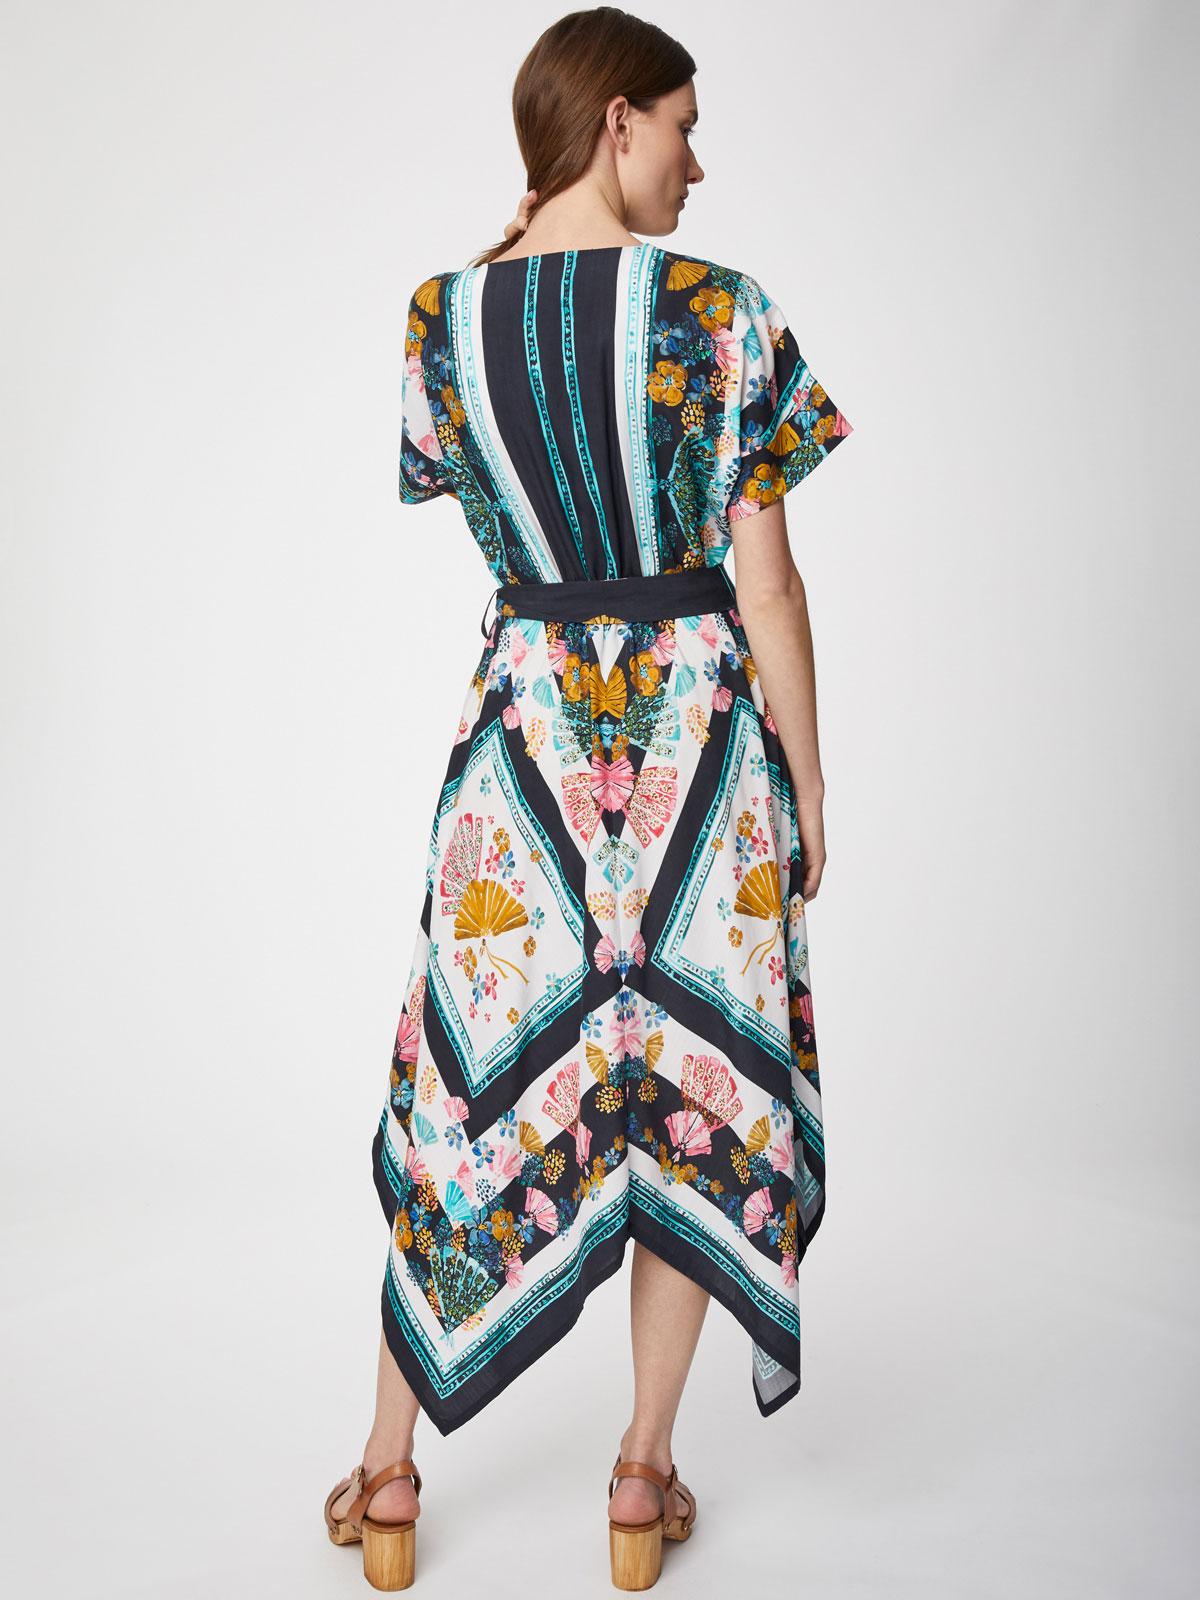 Thought Rhoda Dress